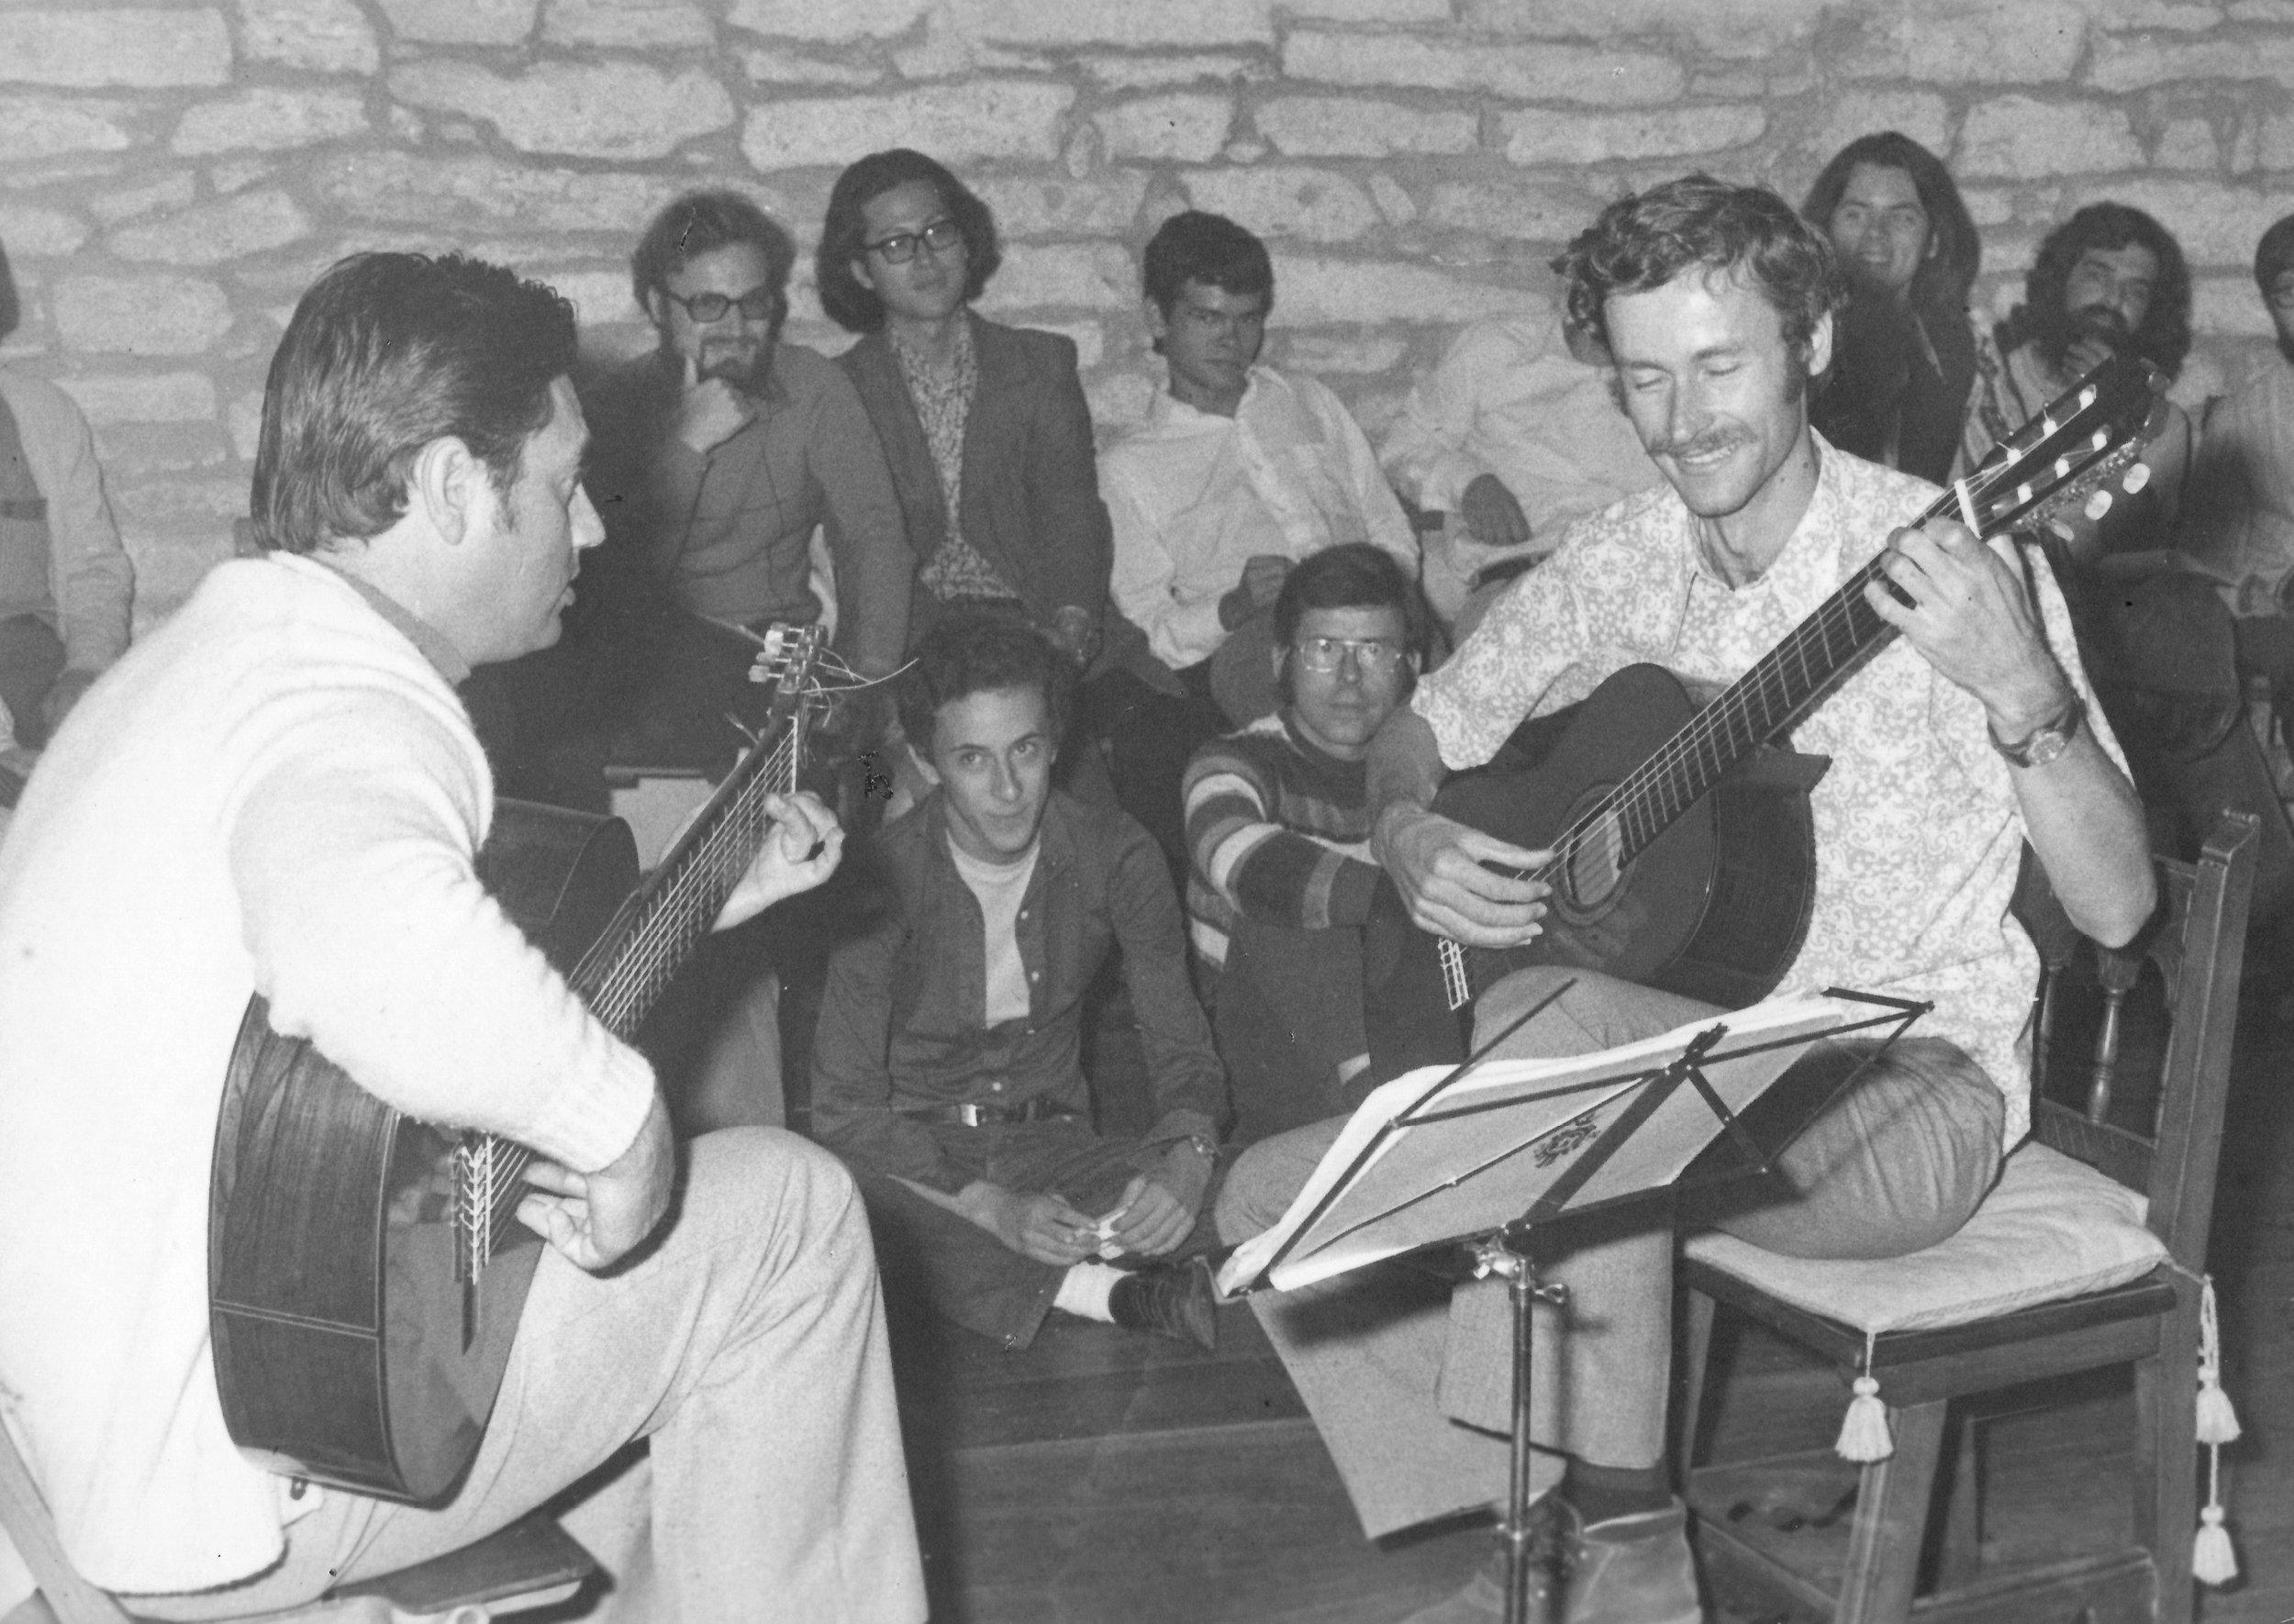 Ken Burns (2 years later) at the 1974 Andre Segovia Summer School in Santiago de Compostela (Jose Tomas - left, Ken Burns - right [now sporting a moustache])